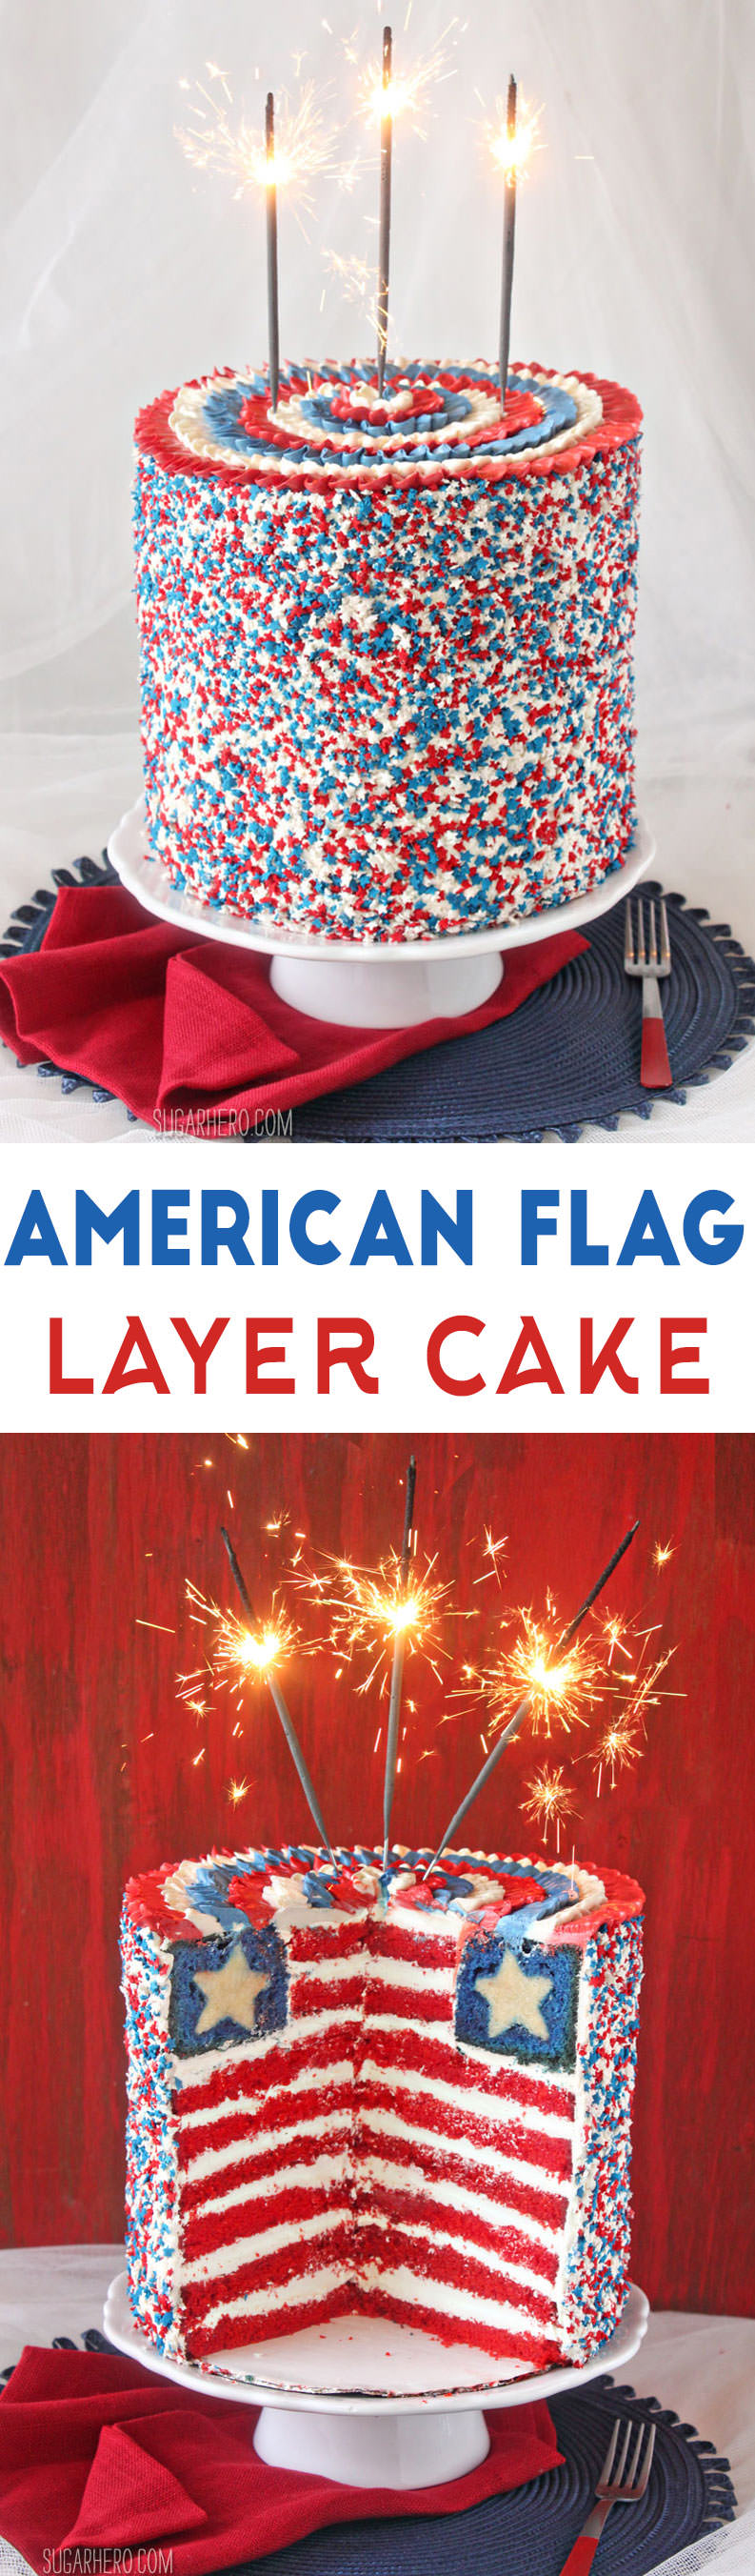 American Flag Layer Cake | From SugarHero.com